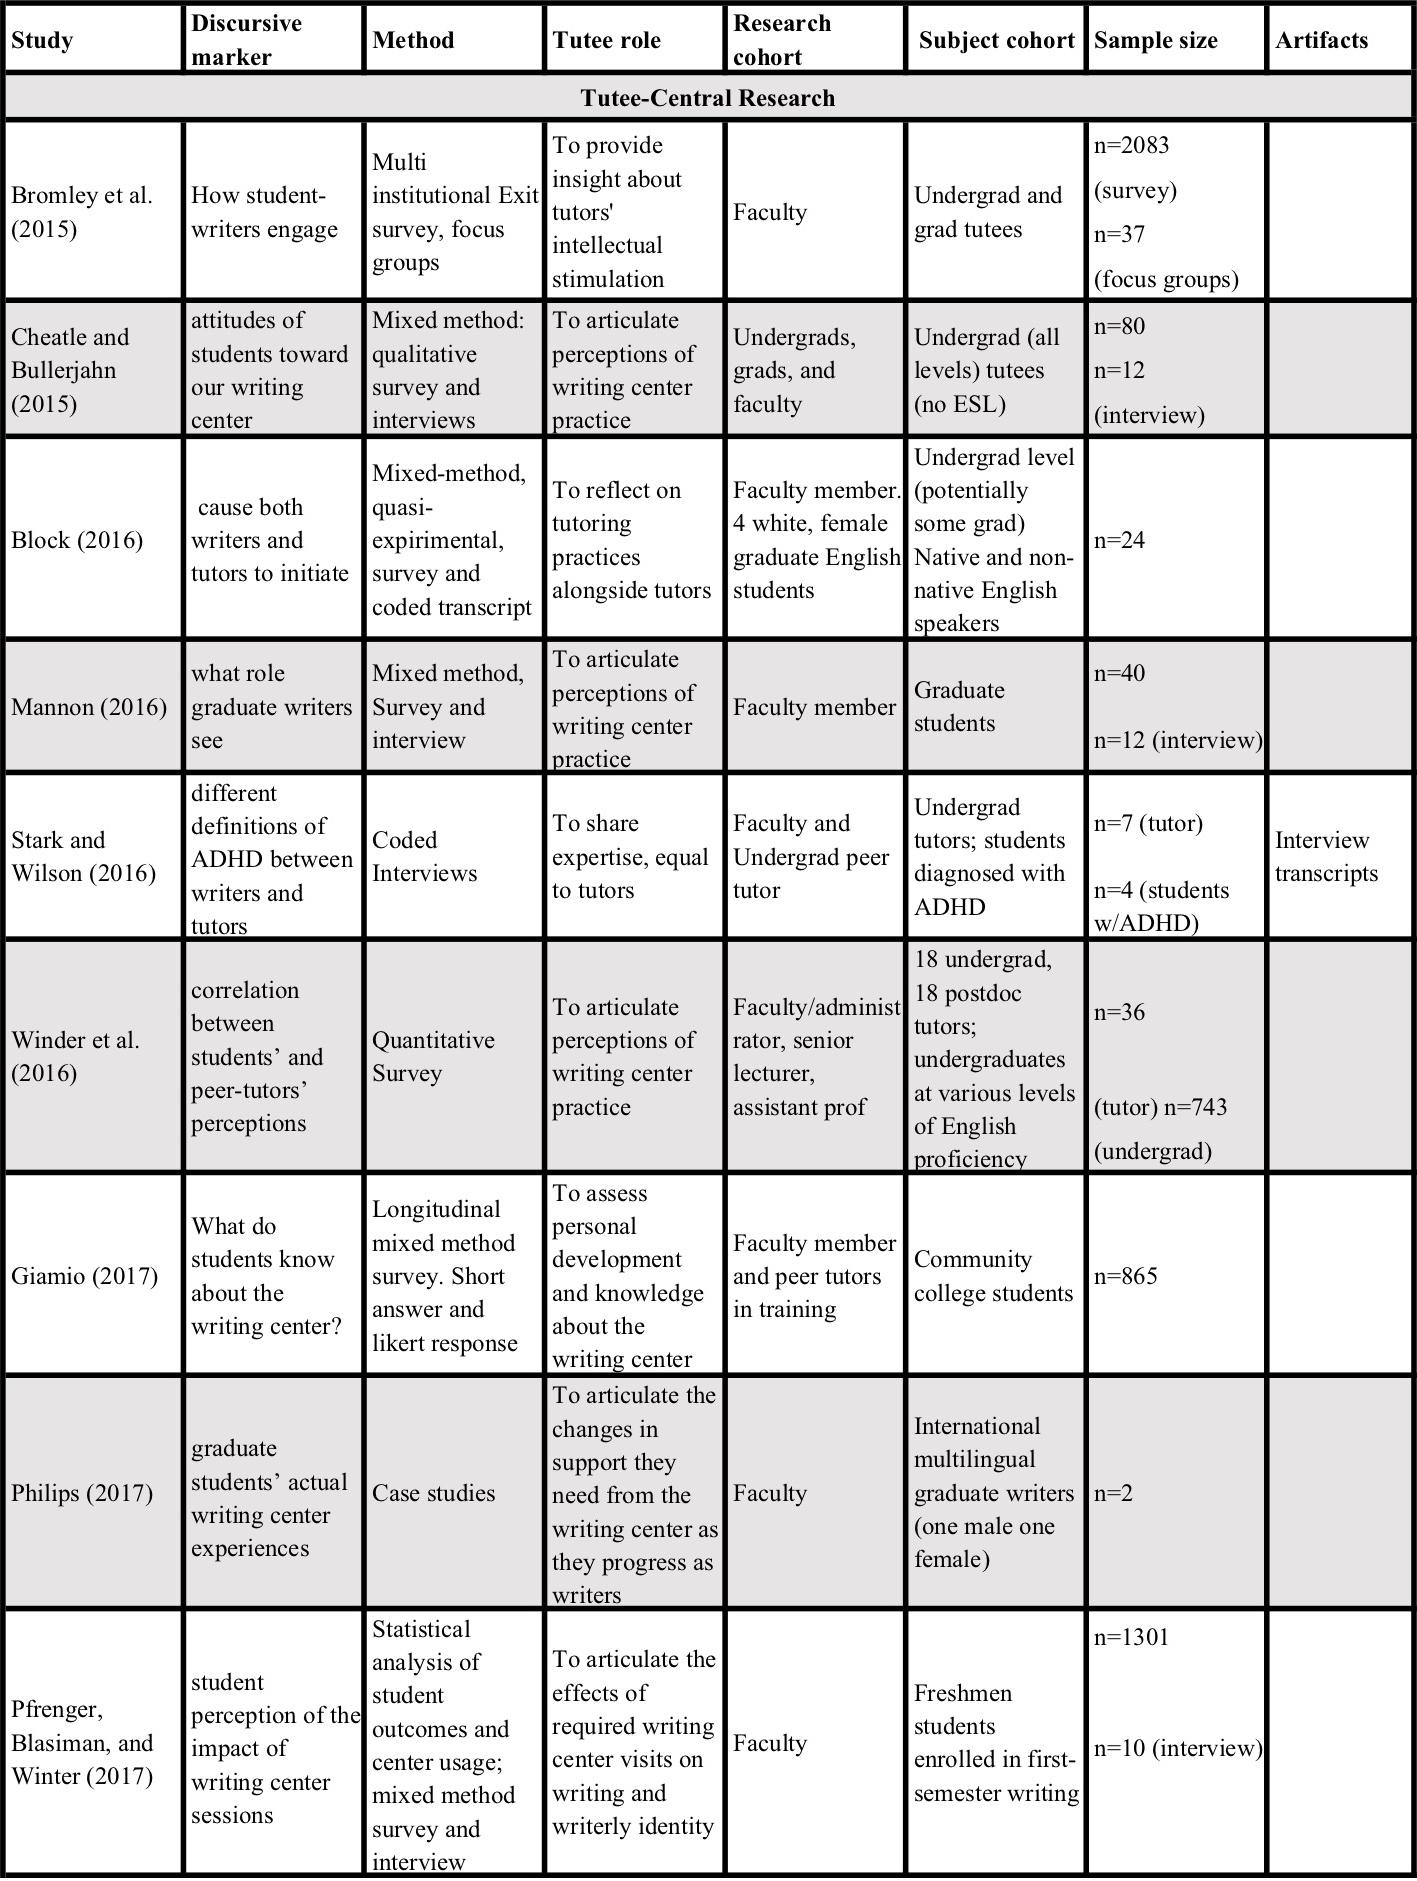 Hashlamon table part 1.png